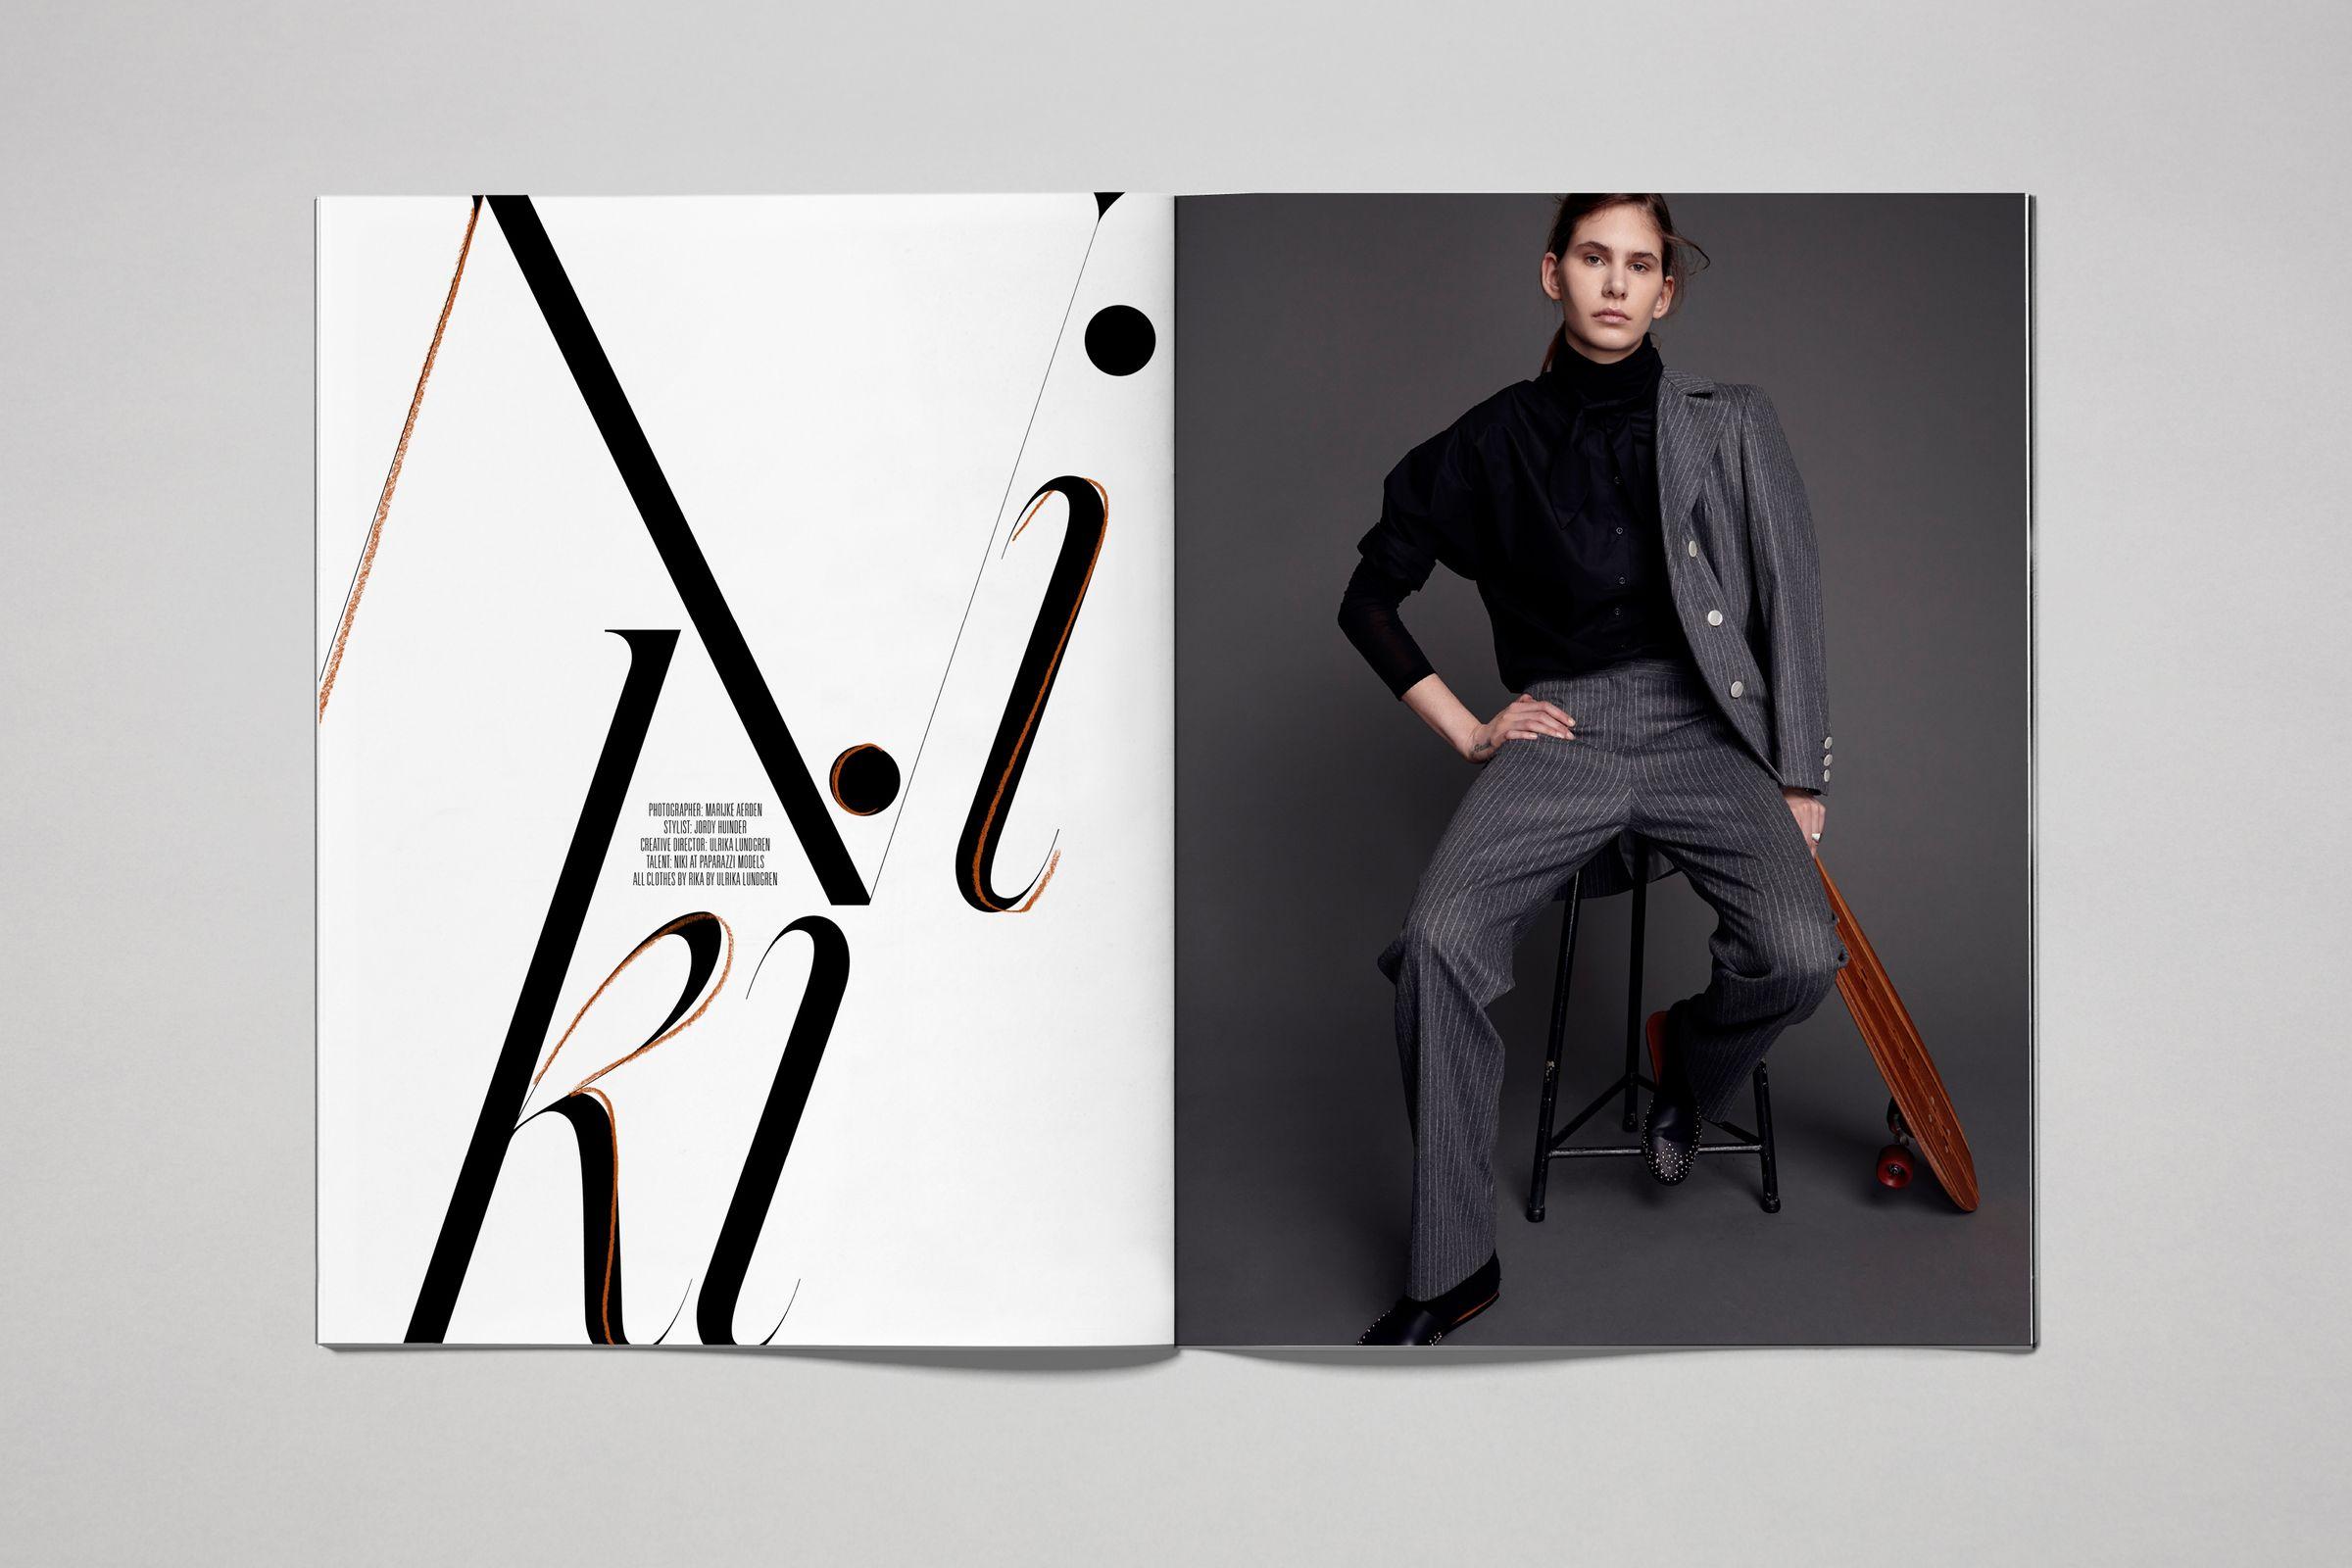 Rika Magazine issue no. 13 Niki photographed by Marijke Aerden